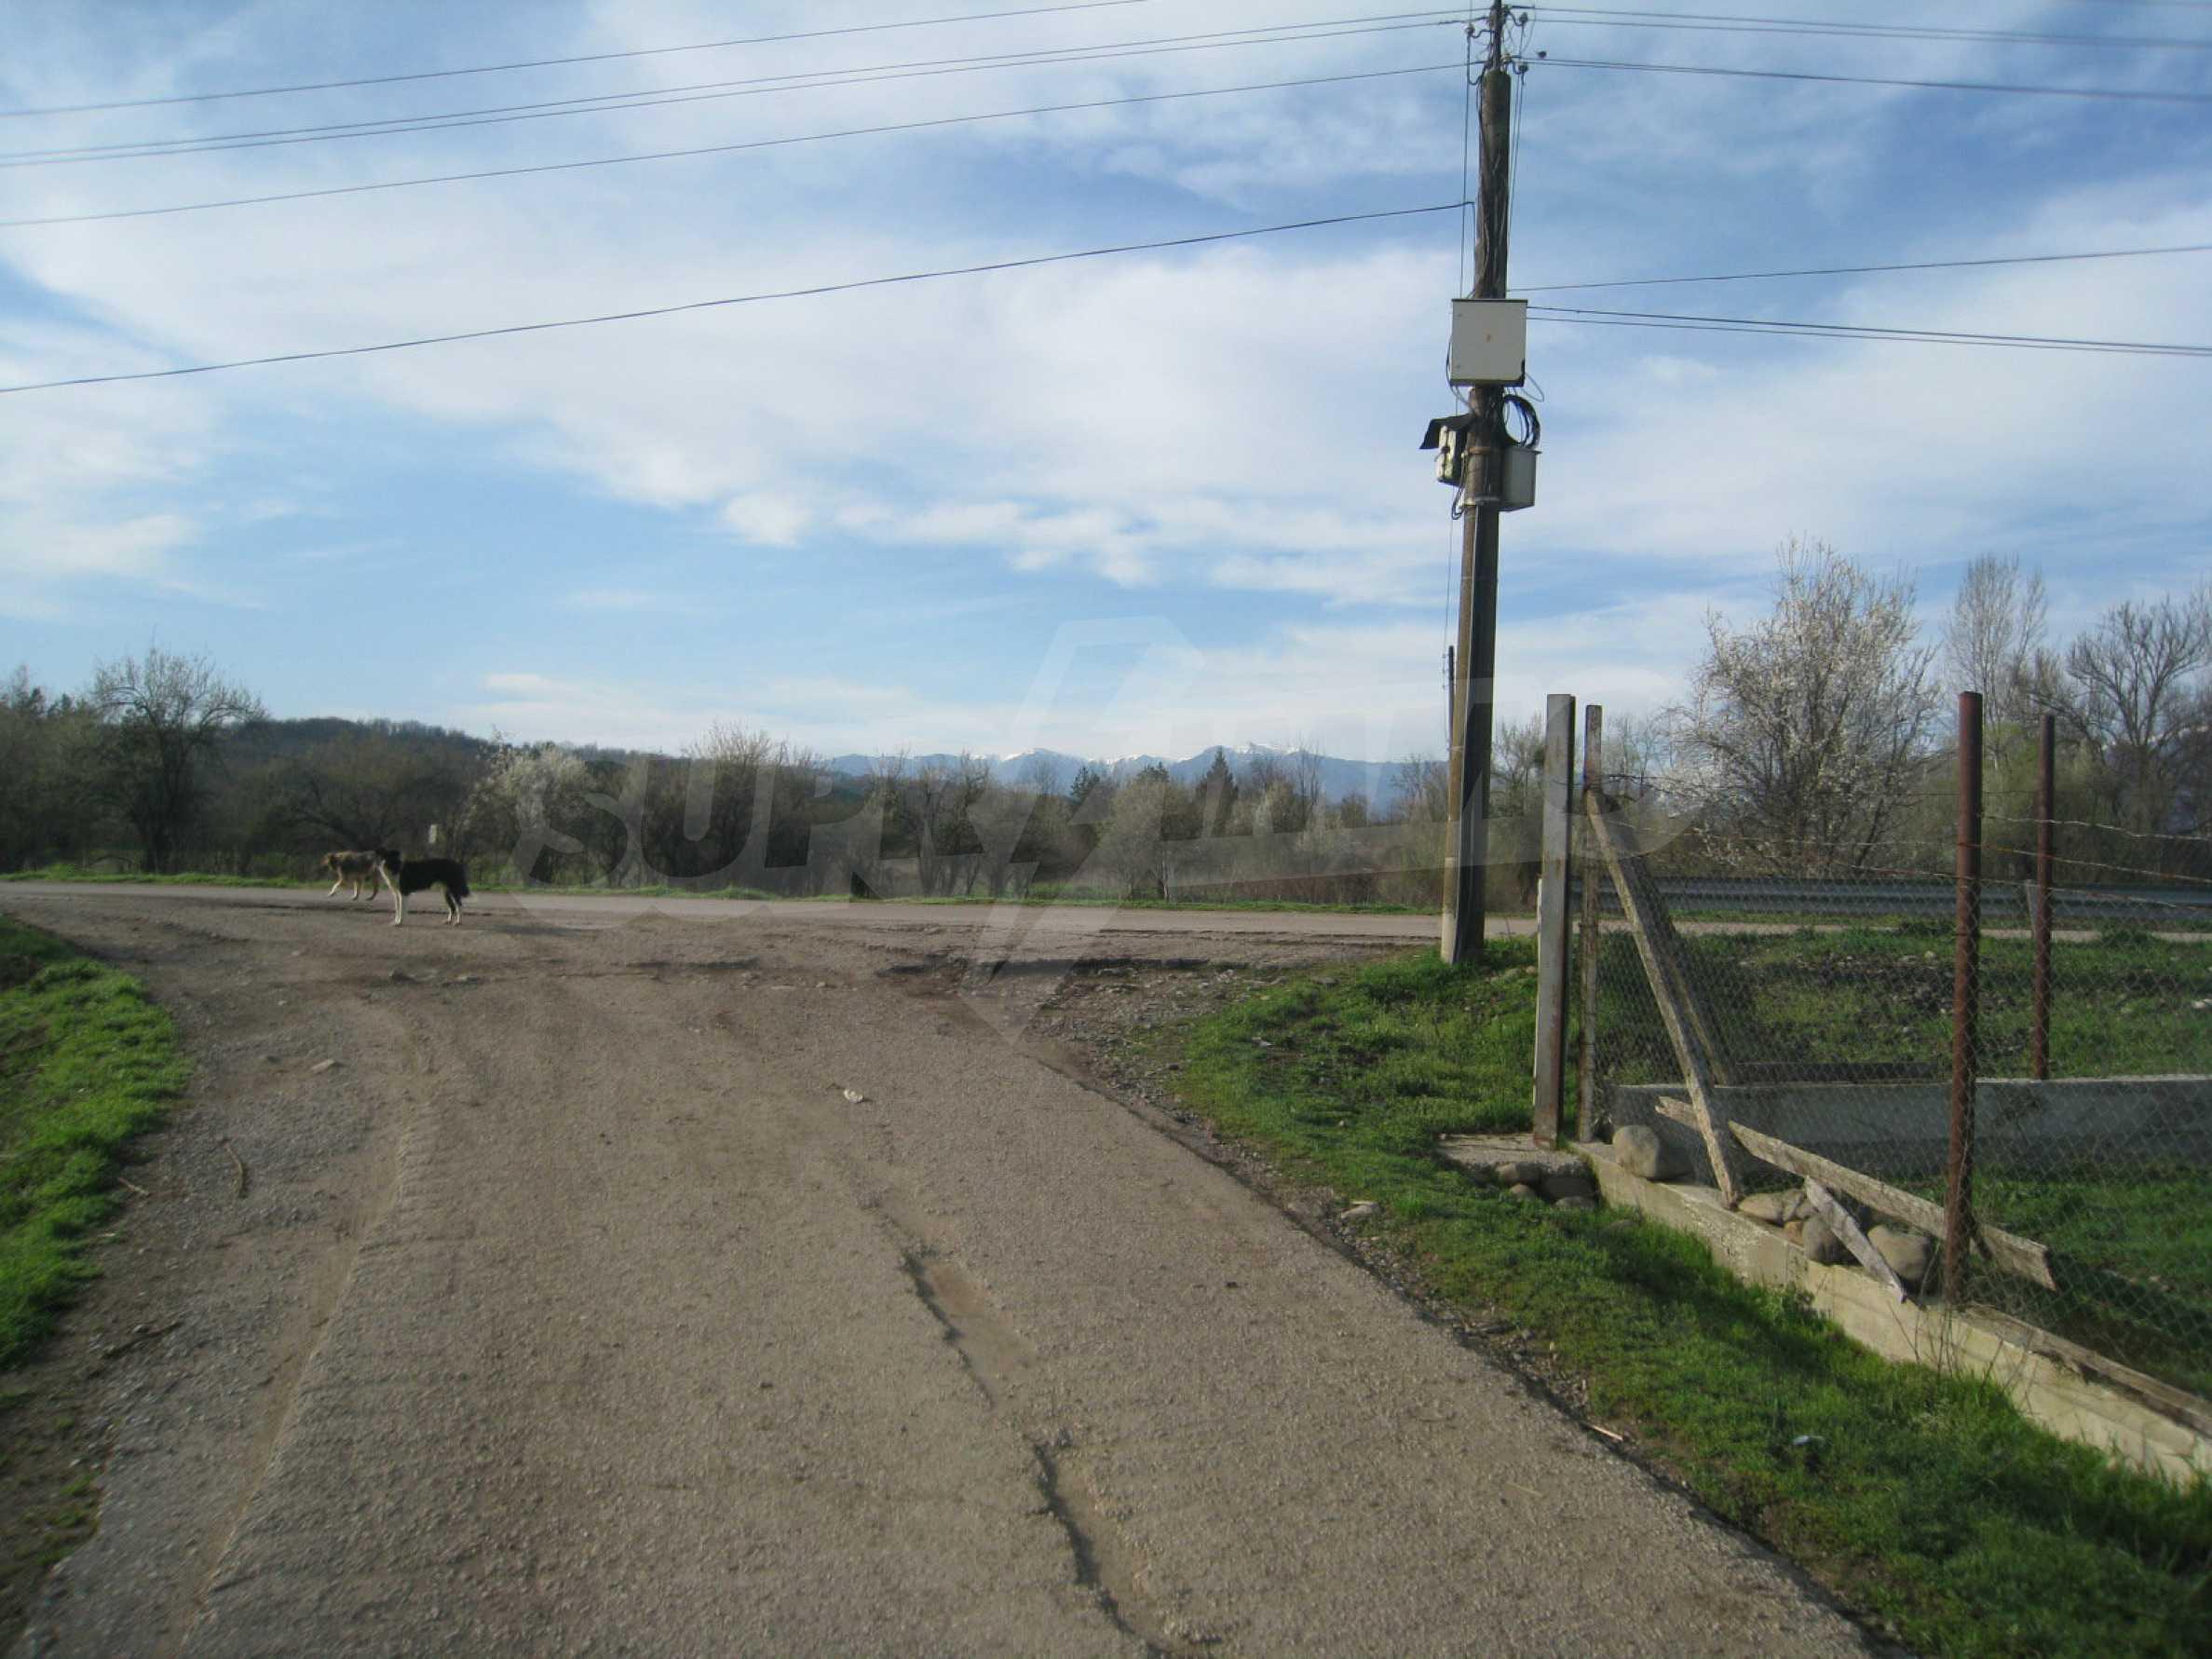 Fishpond, warehouses, residential areas and asphalt ground near Montana 49